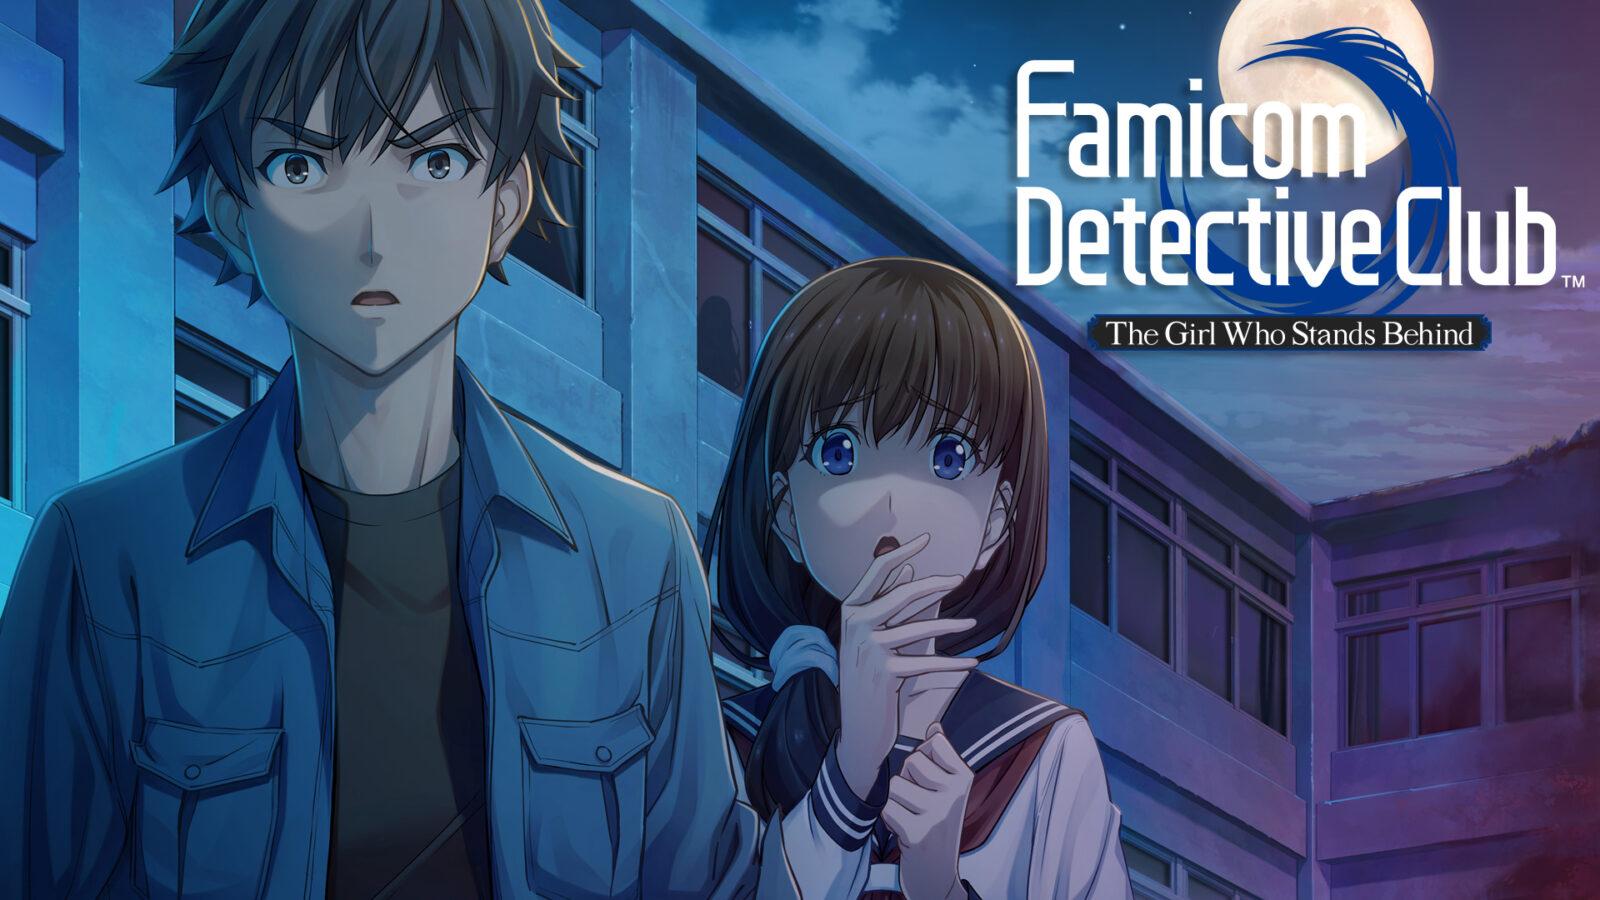 yoshio-sakamoto-famicom-detective-club-metroid